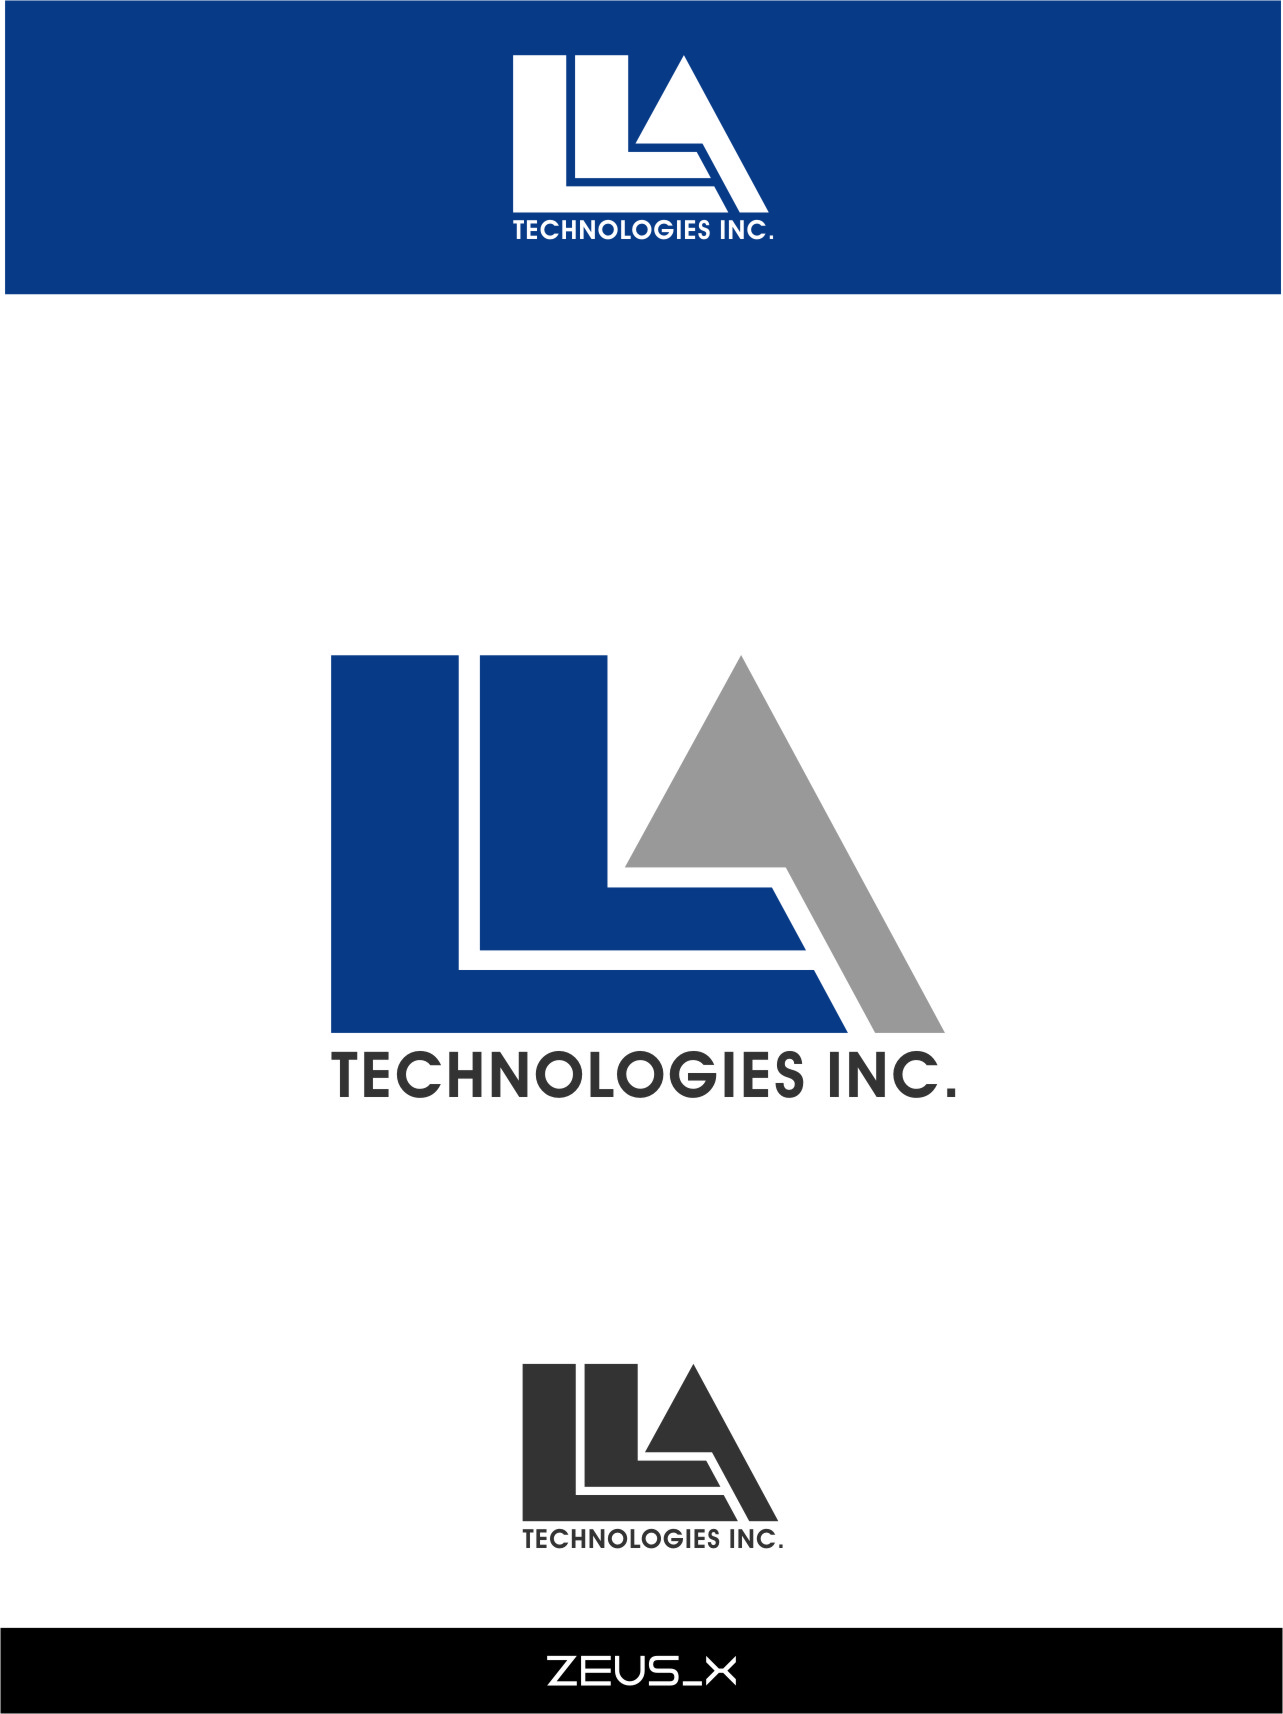 Logo Design by Ngepet_art - Entry No. 173 in the Logo Design Contest Inspiring Logo Design for LLA Technologies Inc..